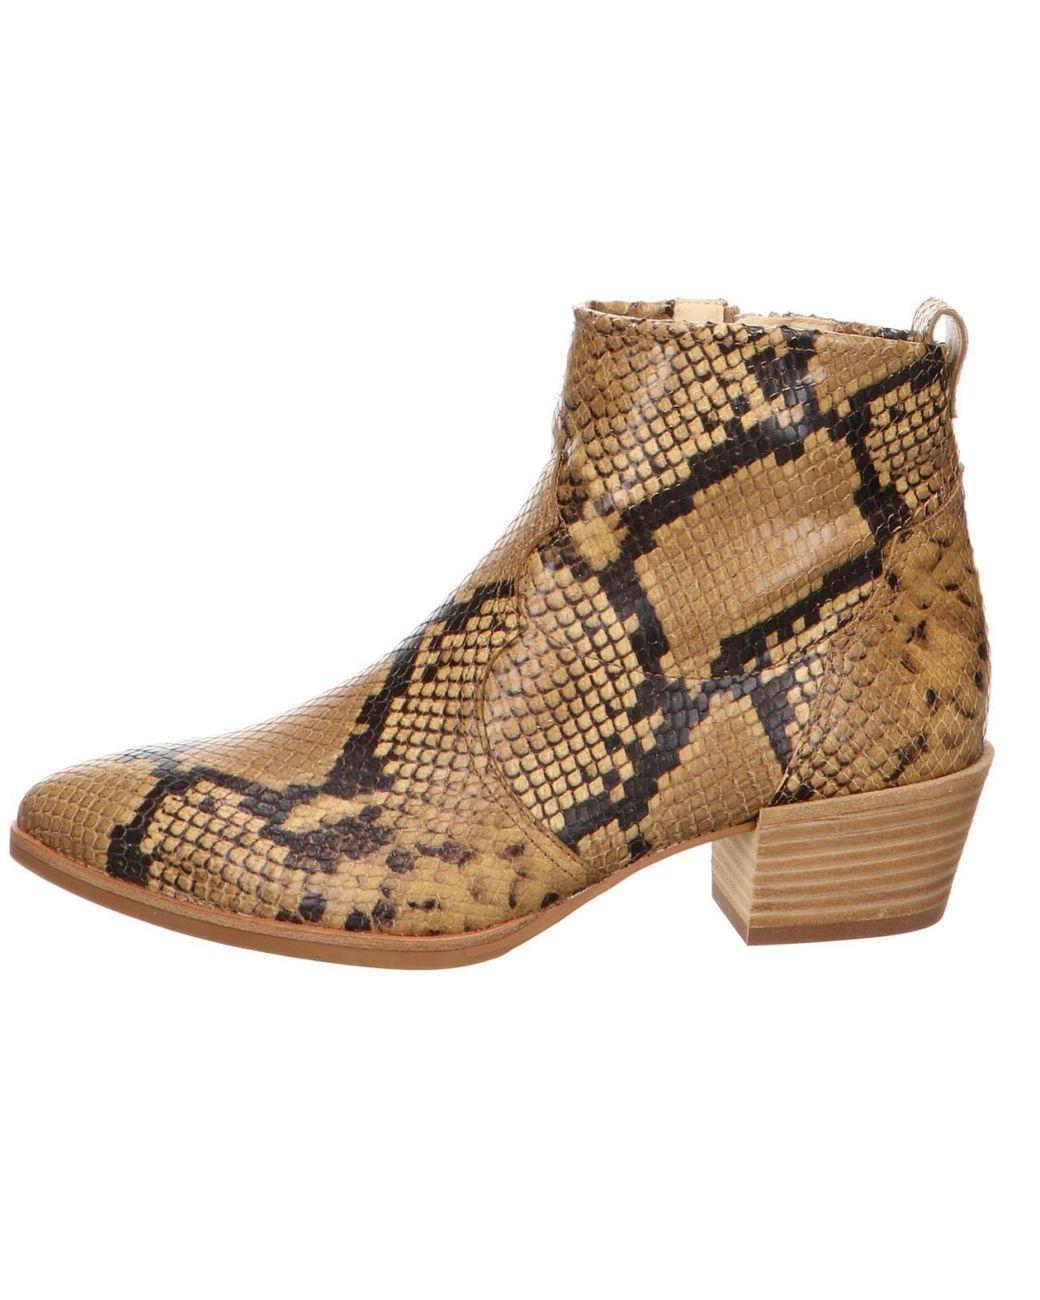 Paul Green Damen Stiefel Stiefeletten Boots Winter 9324-003 Schwarz Neu